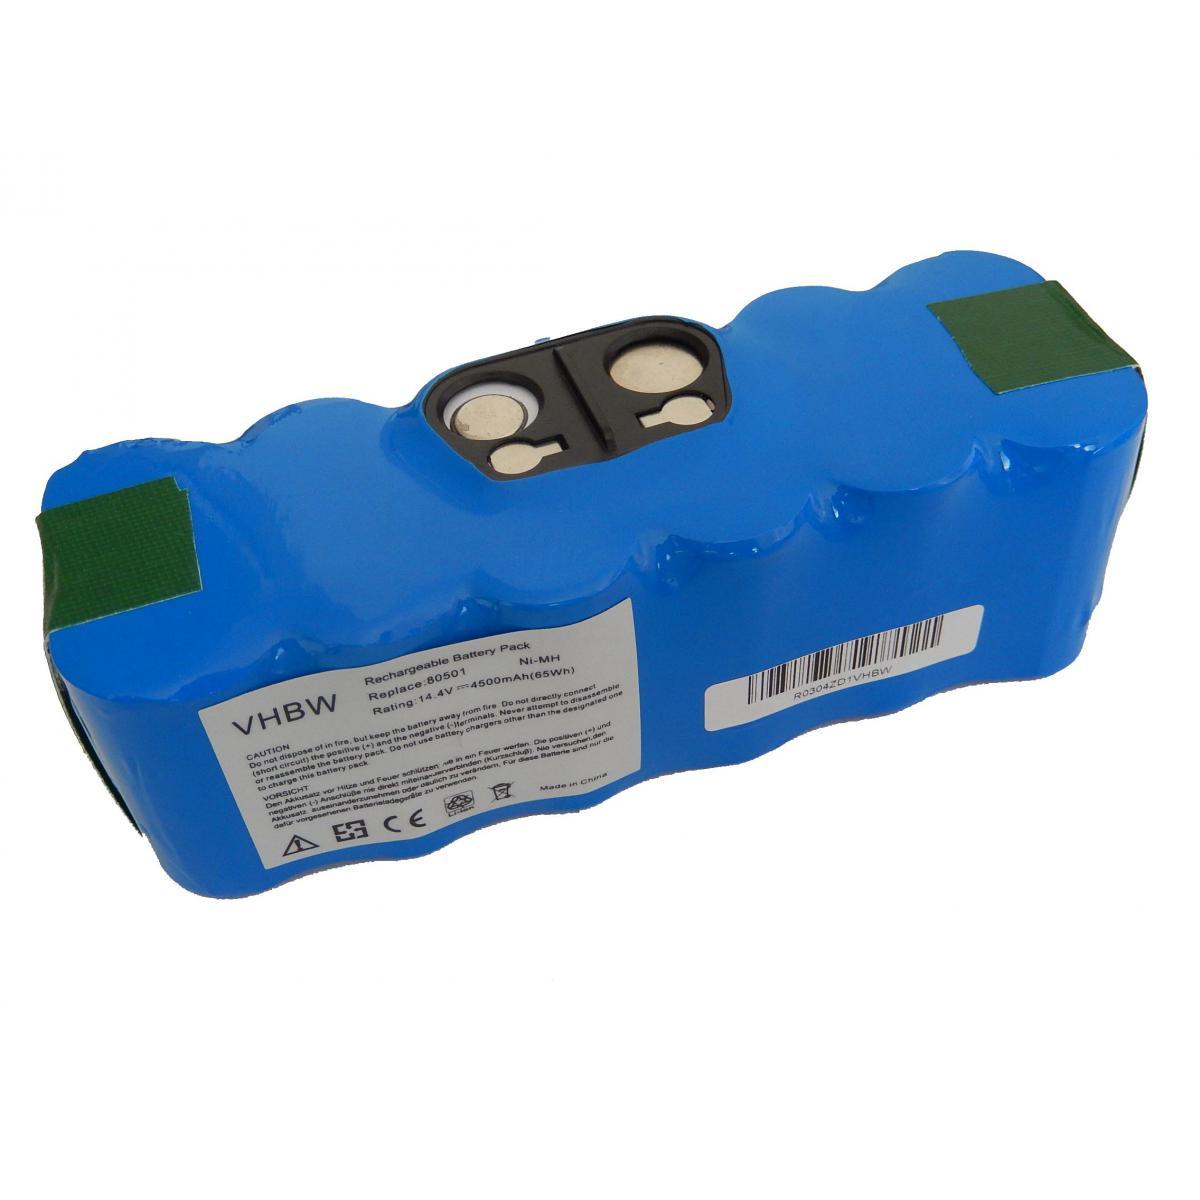 Vhbw vhbw batterie Ni-MH 4500mAh (14.4V) compatible avec iRobot Roomba 605, 615, 616, 621, 651 aspirateur remplace 11702, GD-